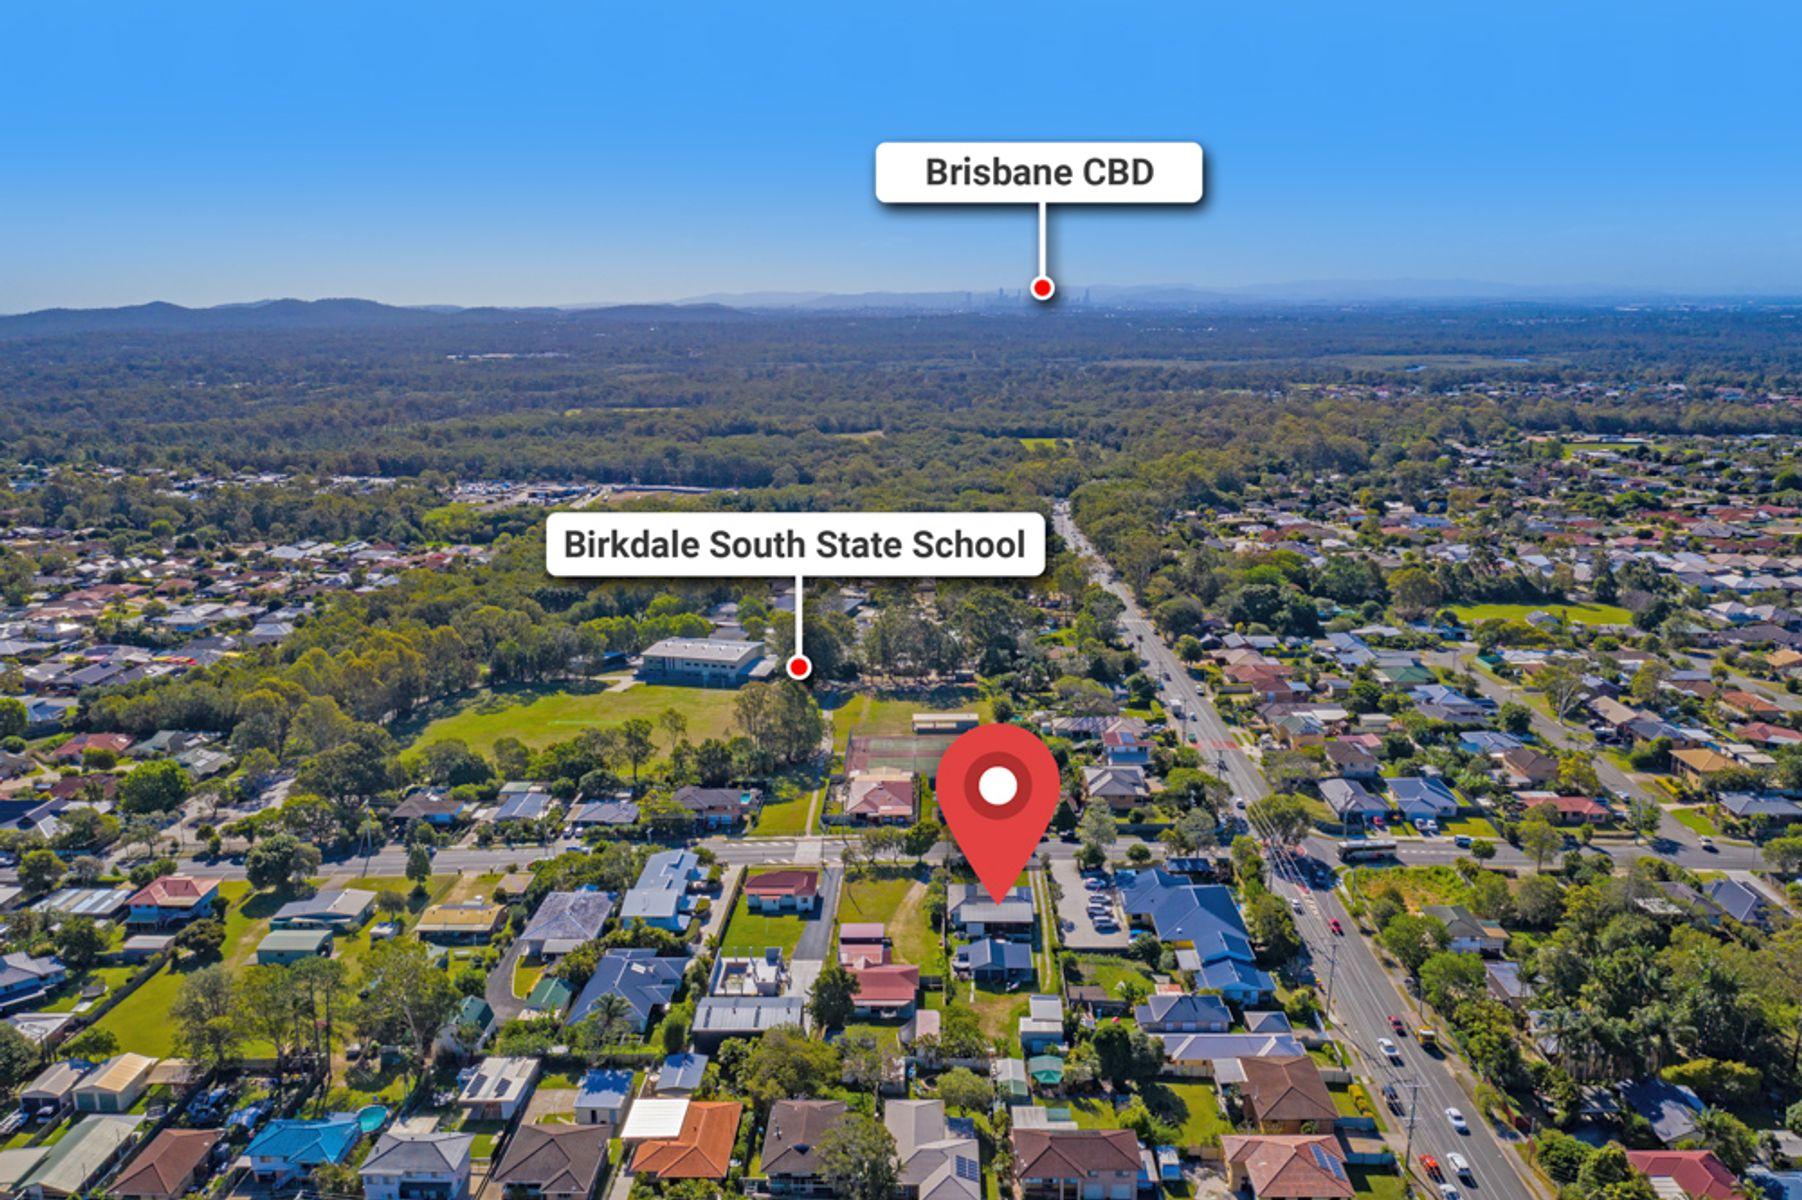 37-39 Barron Road, Birkdale, QLD 4159